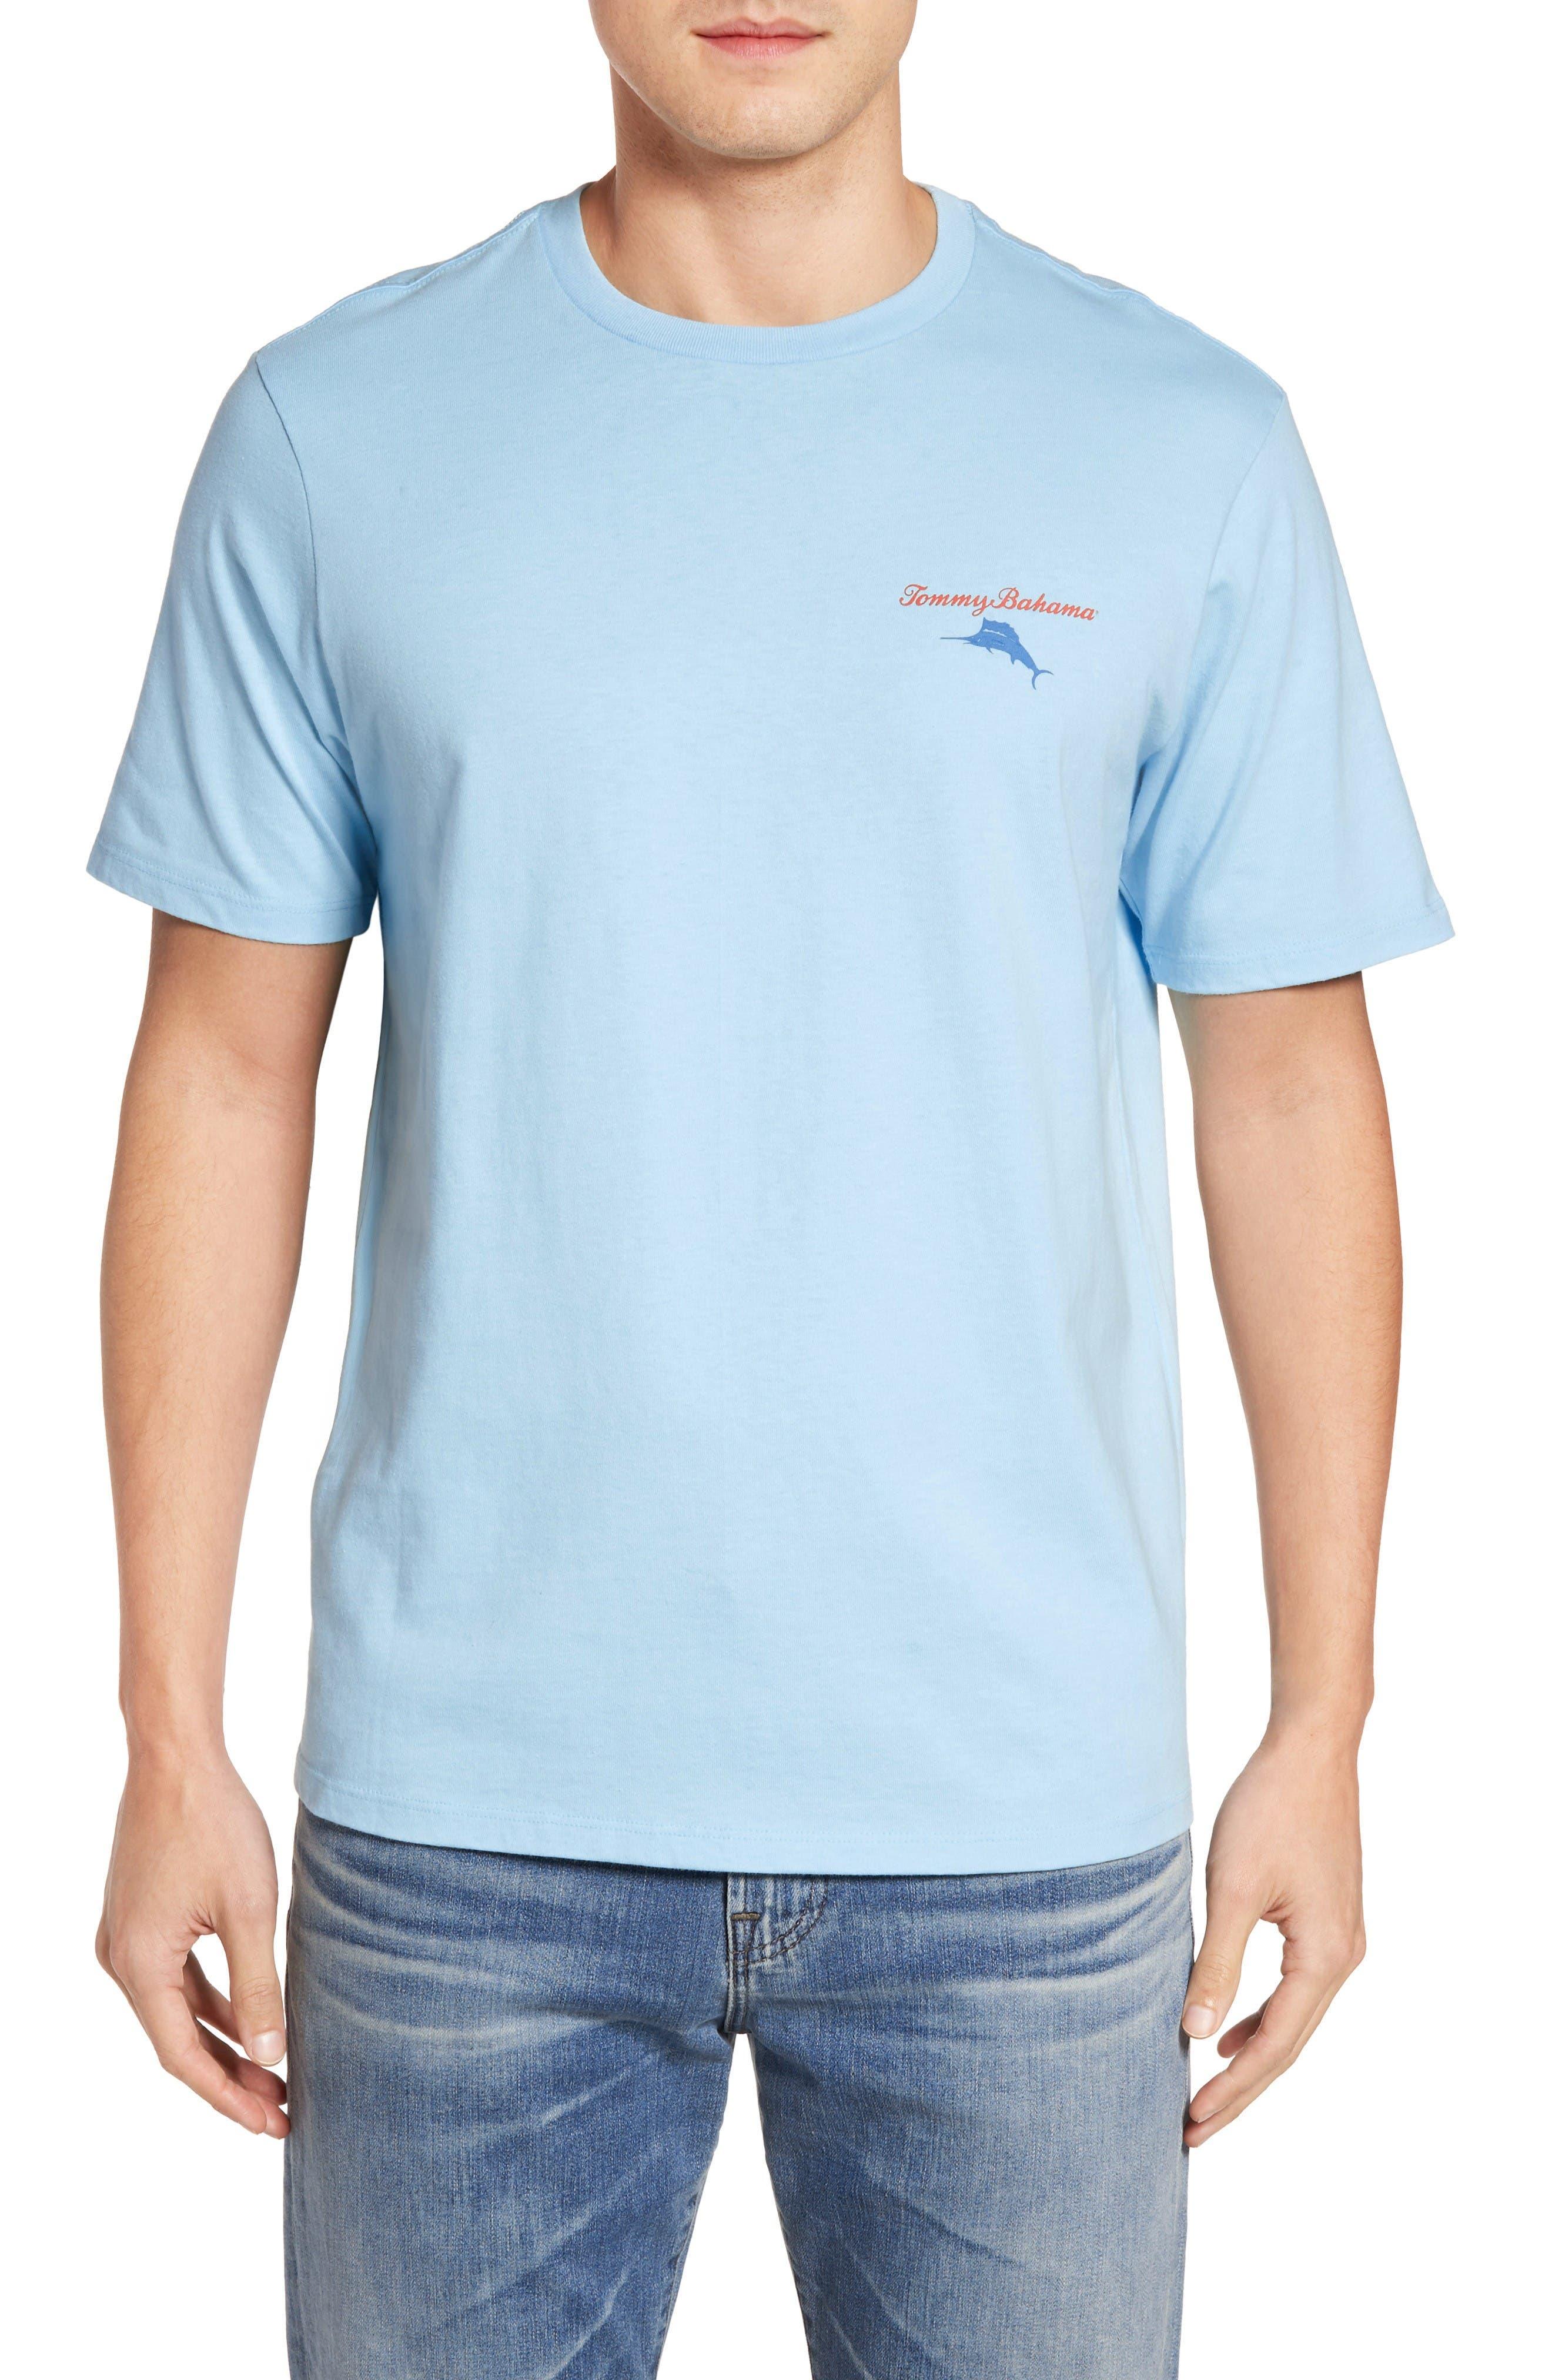 Mr. Ice Guy T-Shirt,                             Alternate thumbnail 2, color,                             Graceful Sea